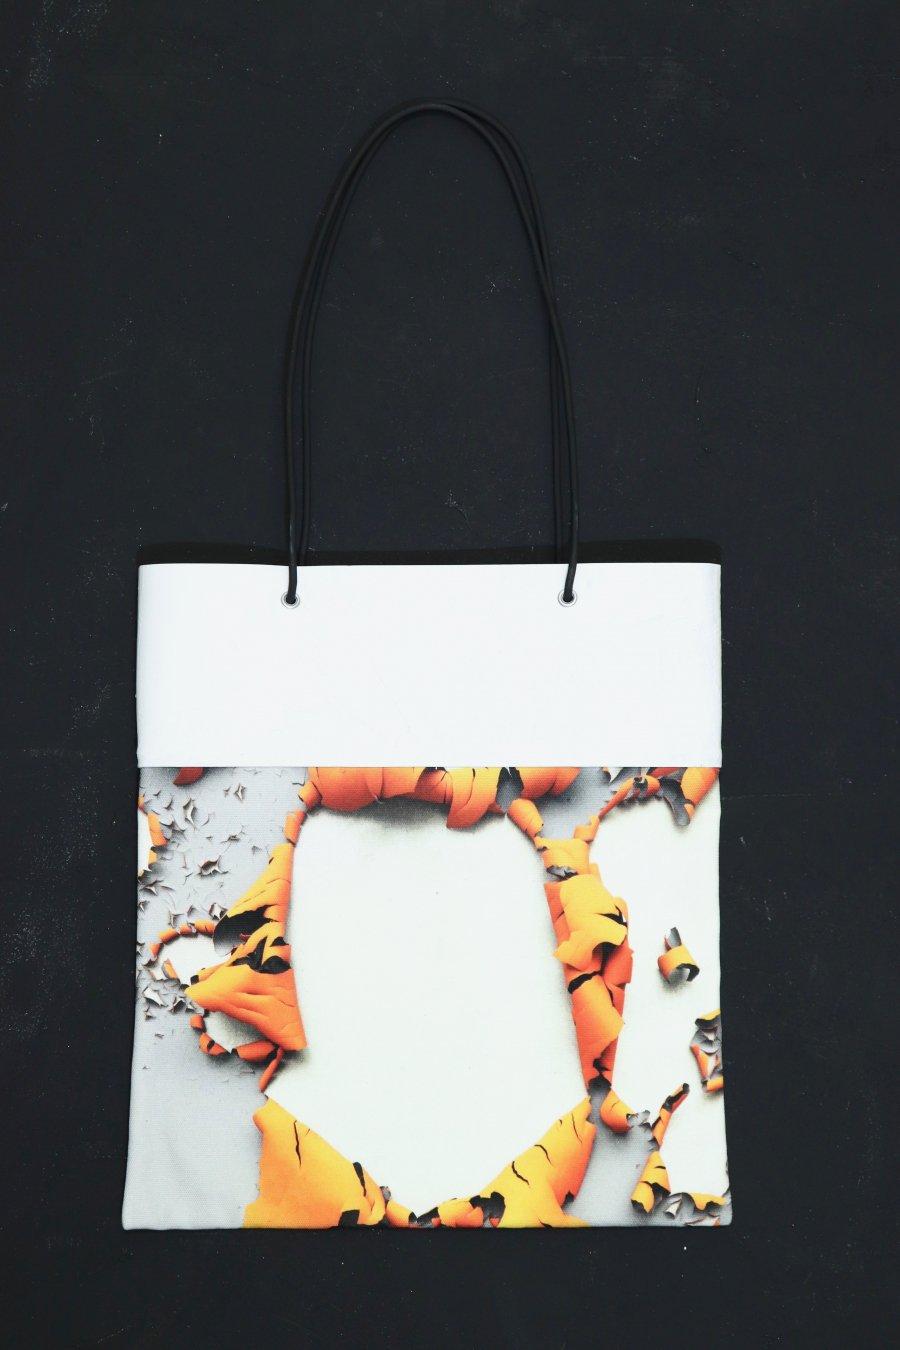 KAGARI YUSUKE  壁布 トートバッグ(松本) ※9月入荷予定予約品